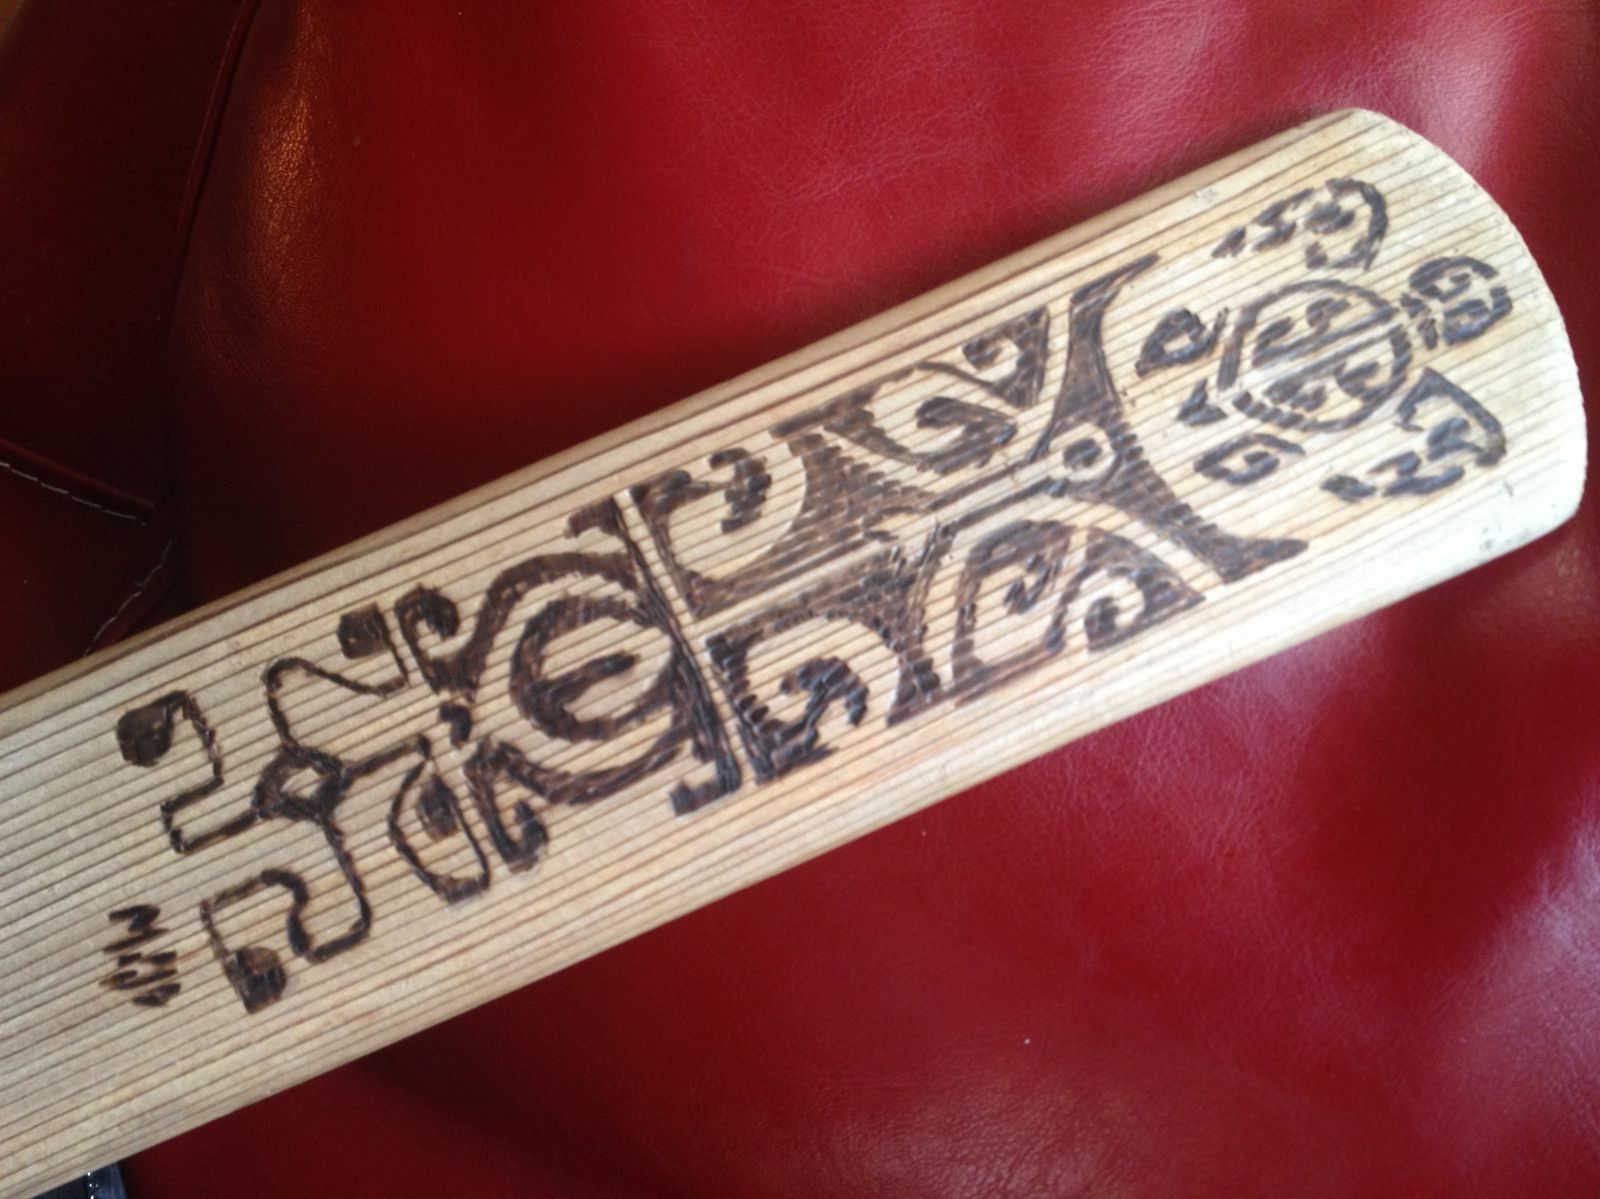 Gravure sur pagaie groenlandaise